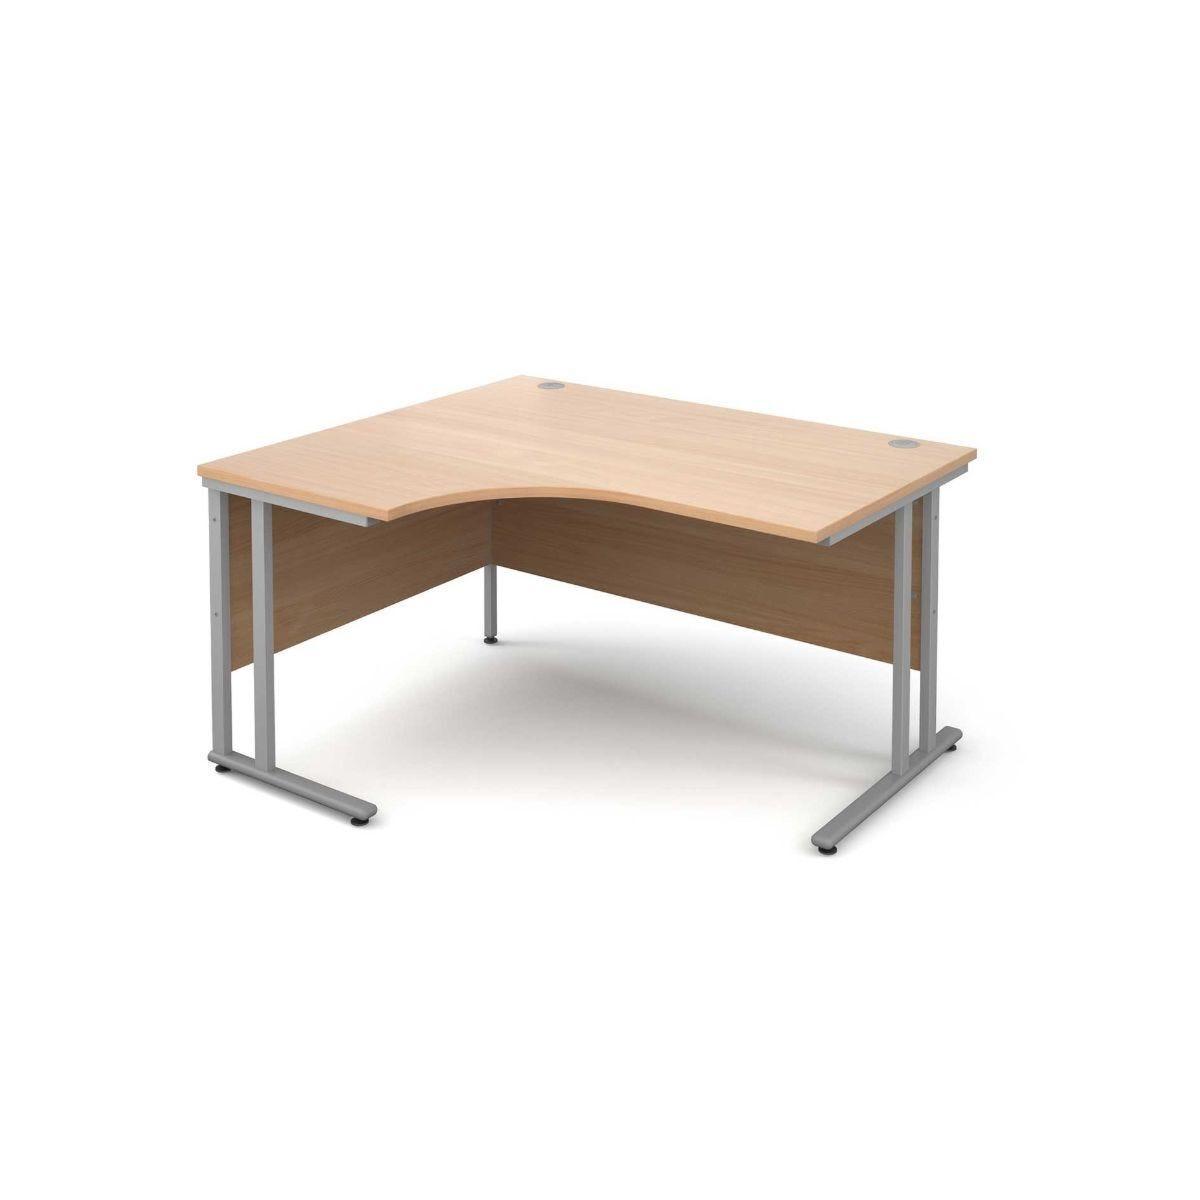 Maestro 25 Left Hand Ergonomic 1400 Desk with Silver Legs